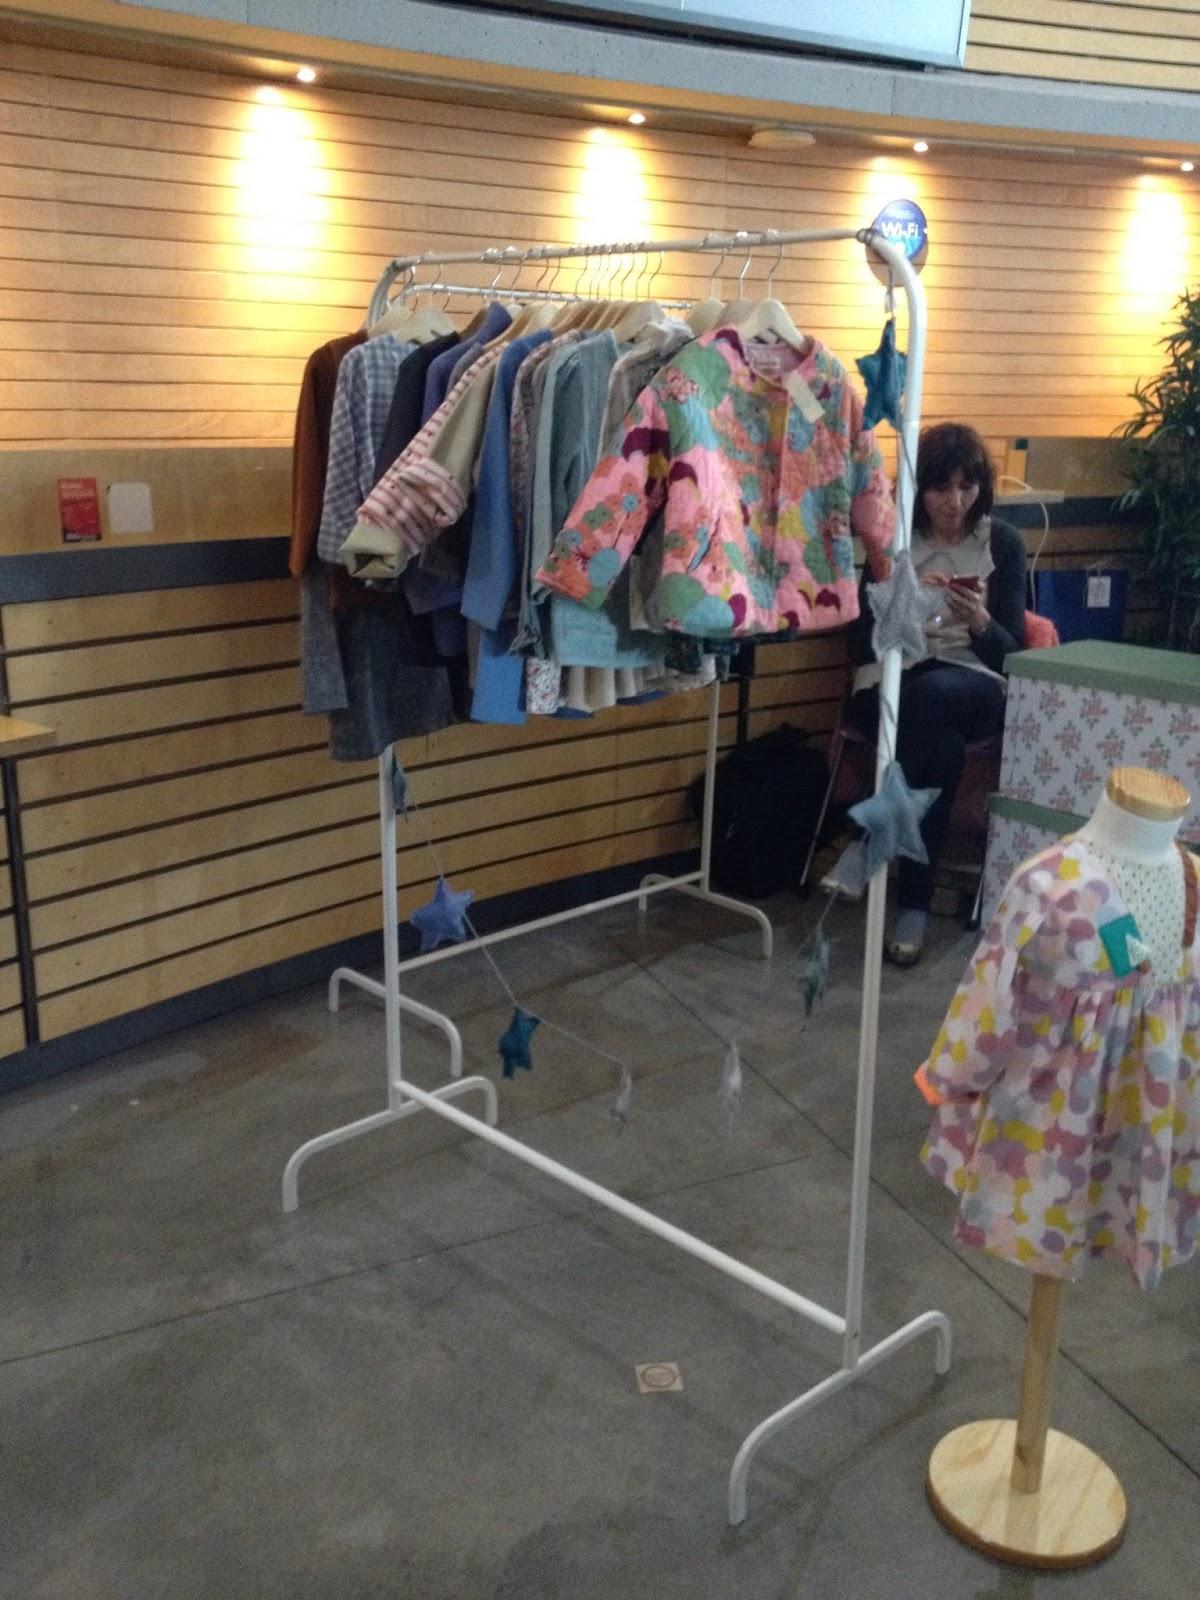 the sunday market Bilbao detalle puesto ropa niño